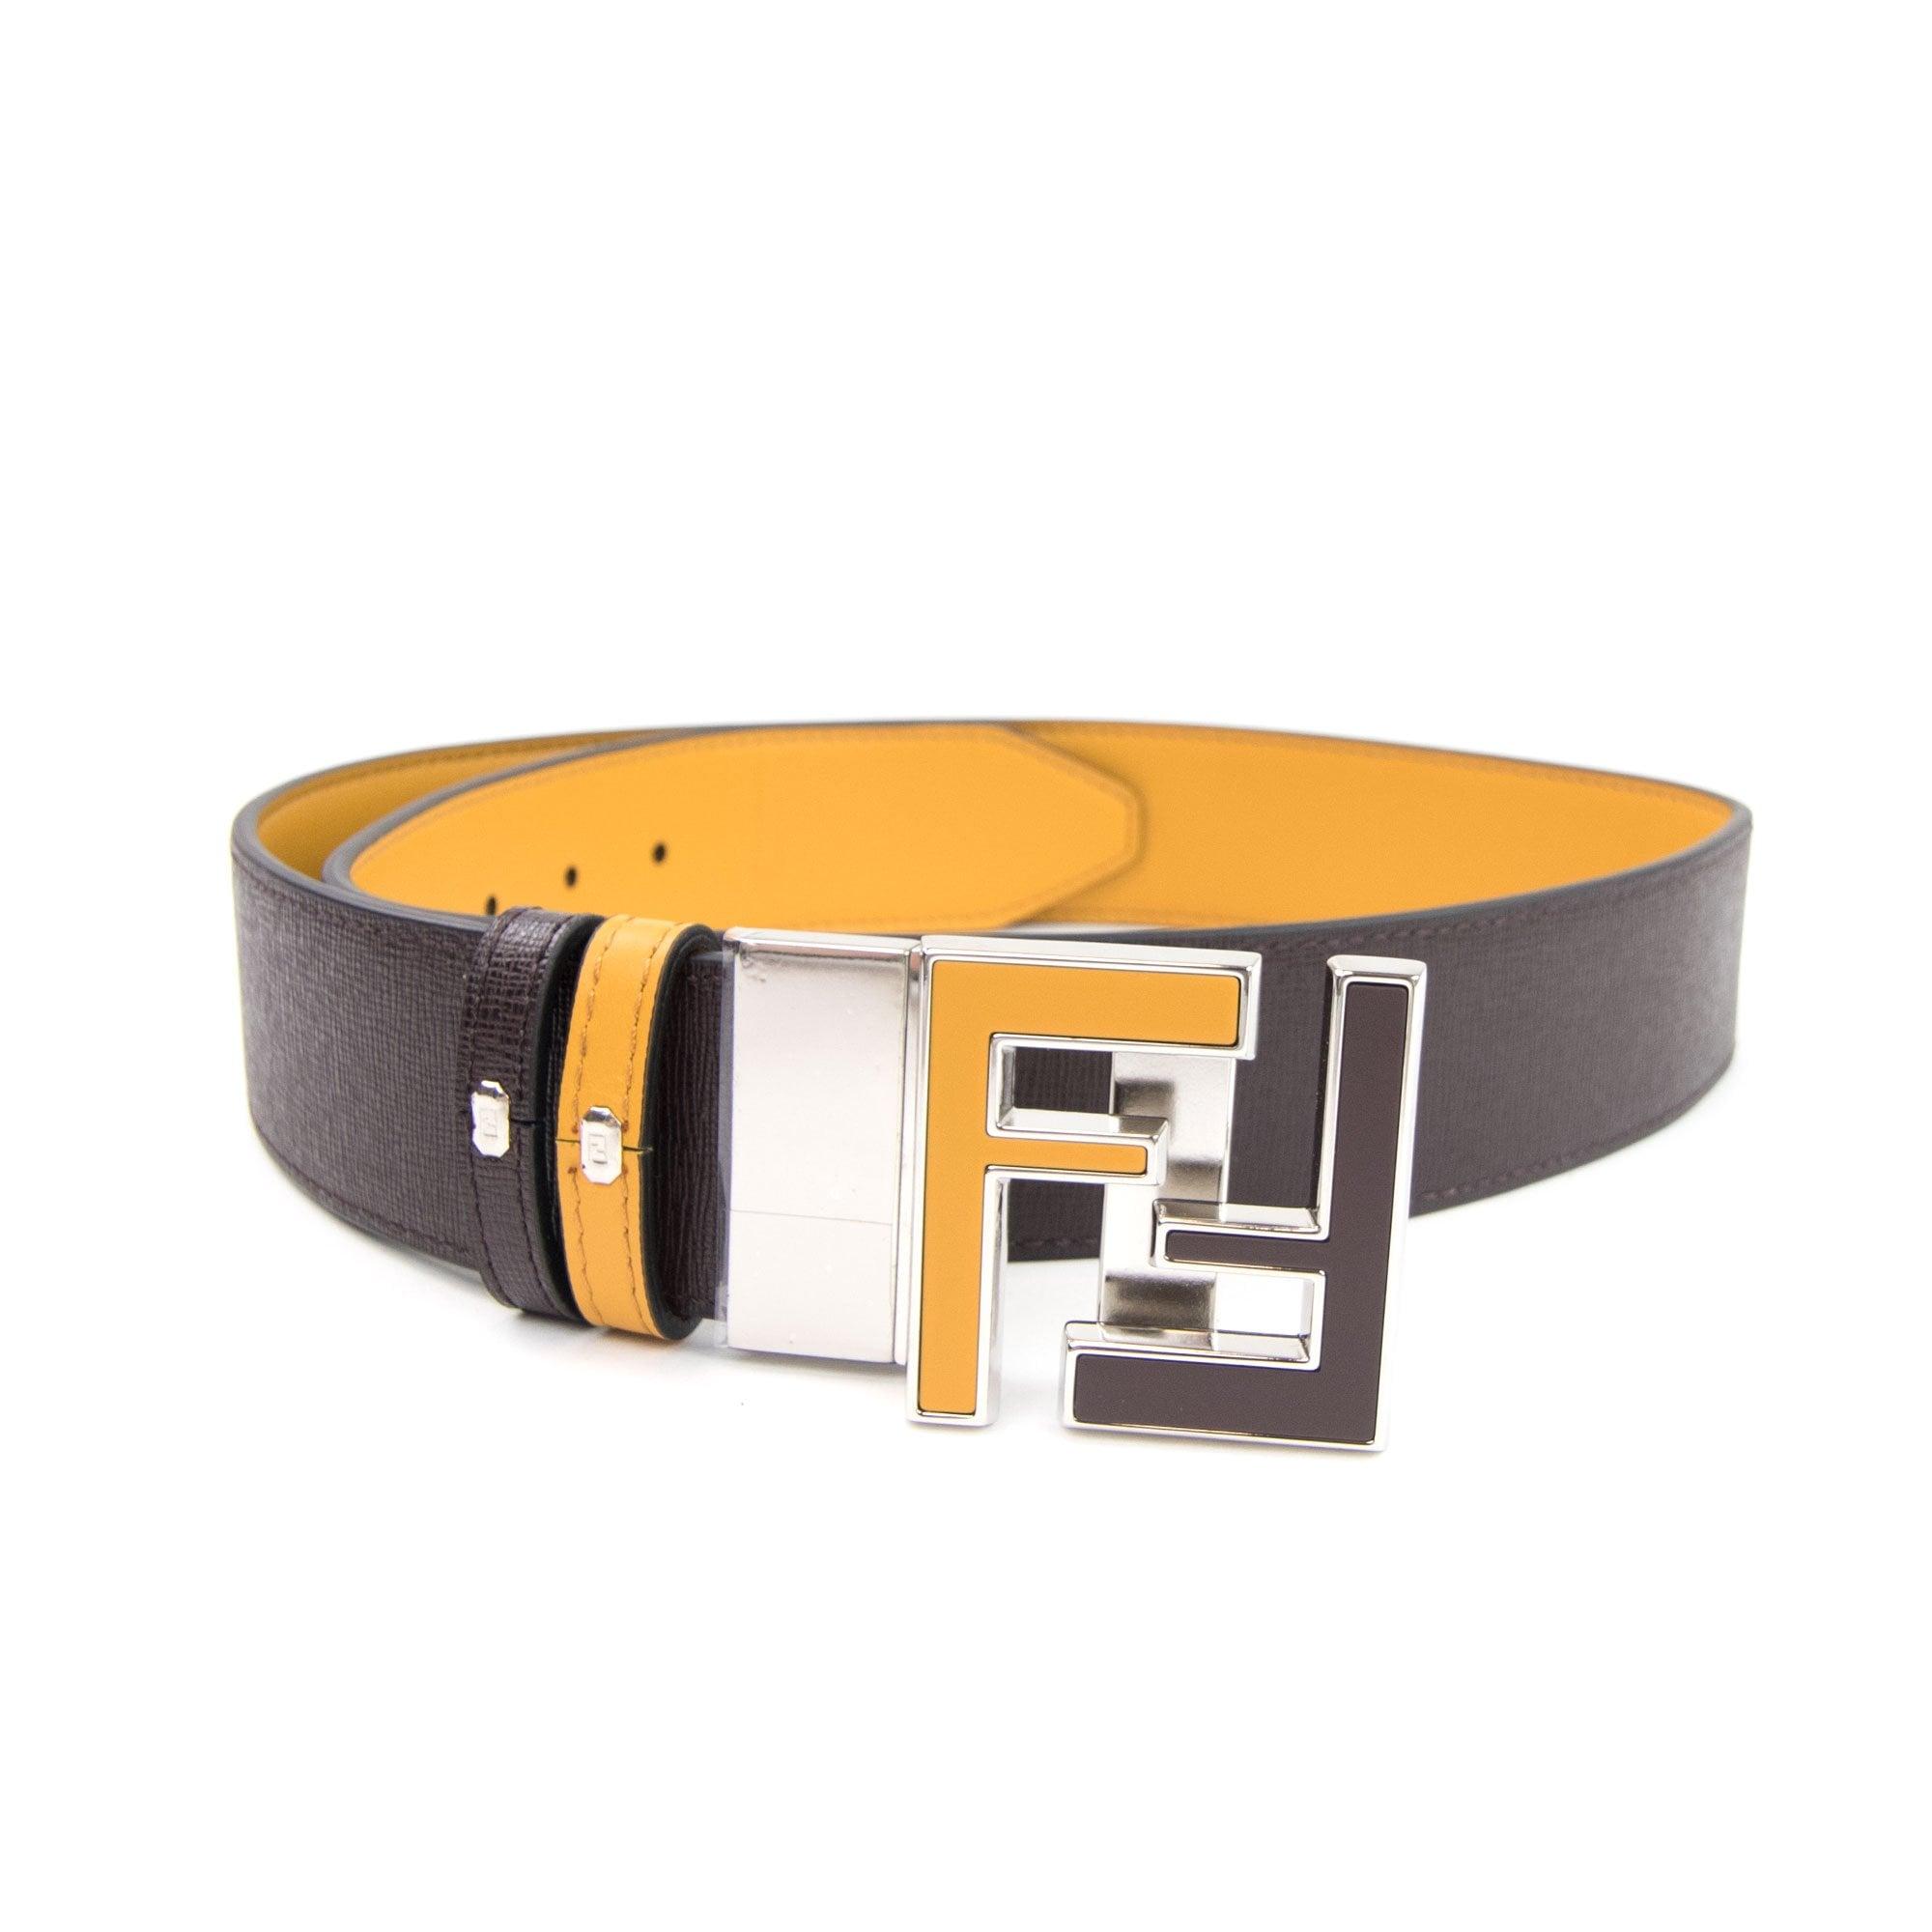 Fendi Ff Logo Smooth Leather Reversible Belt Brown Yellow Onu Fendi belt bags for men. fendi fendi ff logo smooth leather reversible belt brown yellow